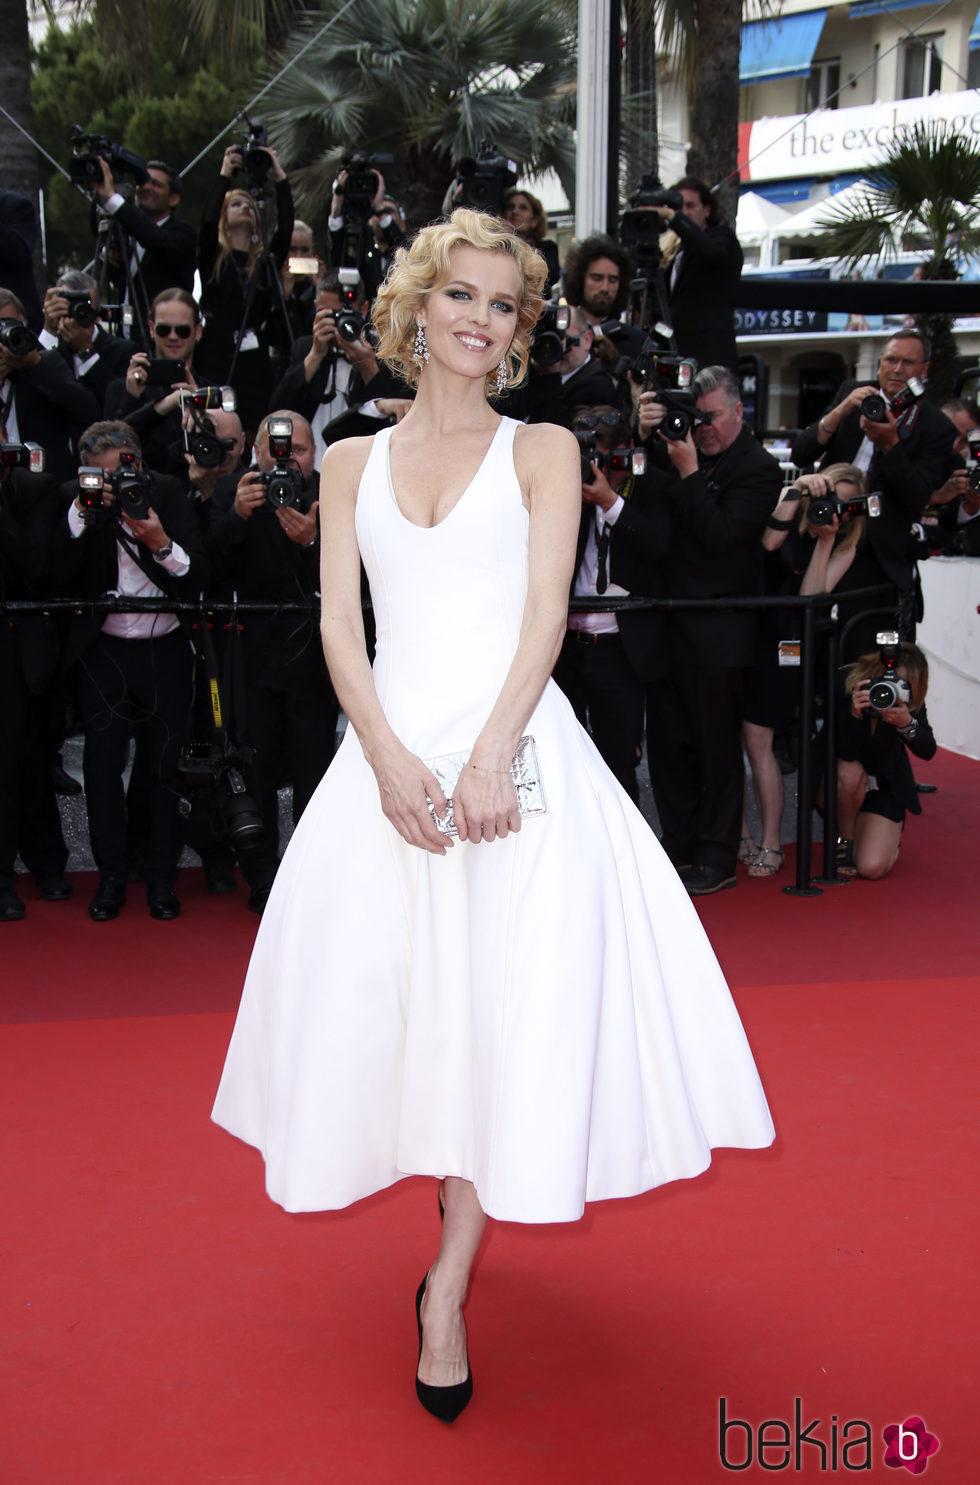 Eva Herzigová en la premiere 'The Unknown girl' en el Festival de Cannes 2016